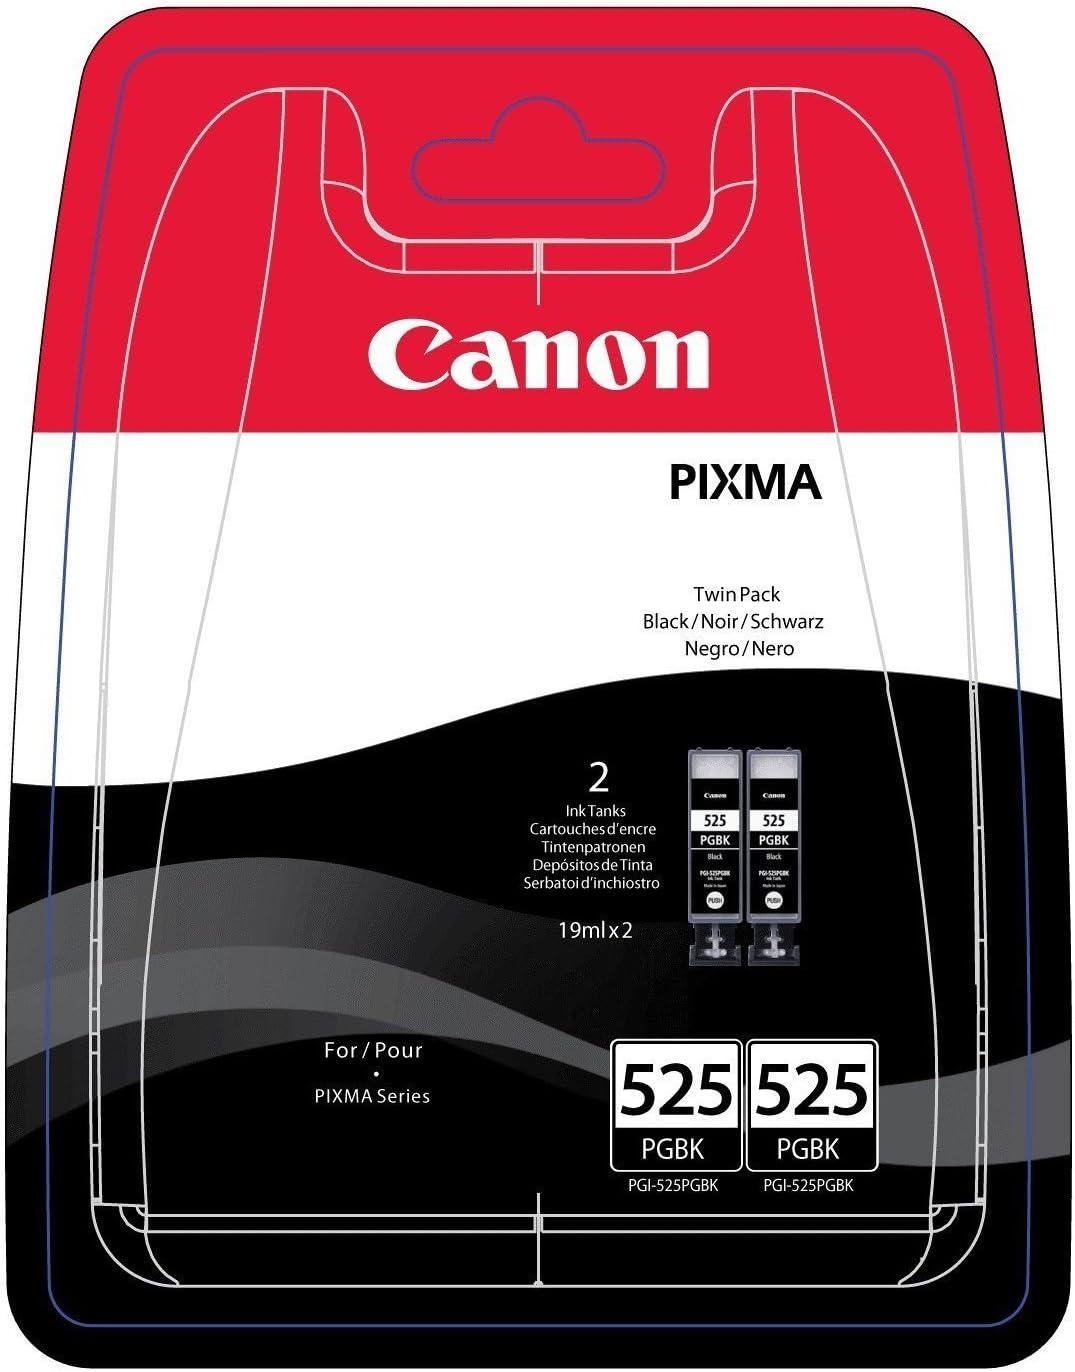 Canon PGI-525 2 Cartuchos Twinpack de tinta original Negro para Impresora de Inyeccion de tinta Pixma MX715-MX885-MX895-MG5150-MG5250-MG5350-MG6150-MG6250-MG8150-MG8250-iP4850-iP4950-iX6550